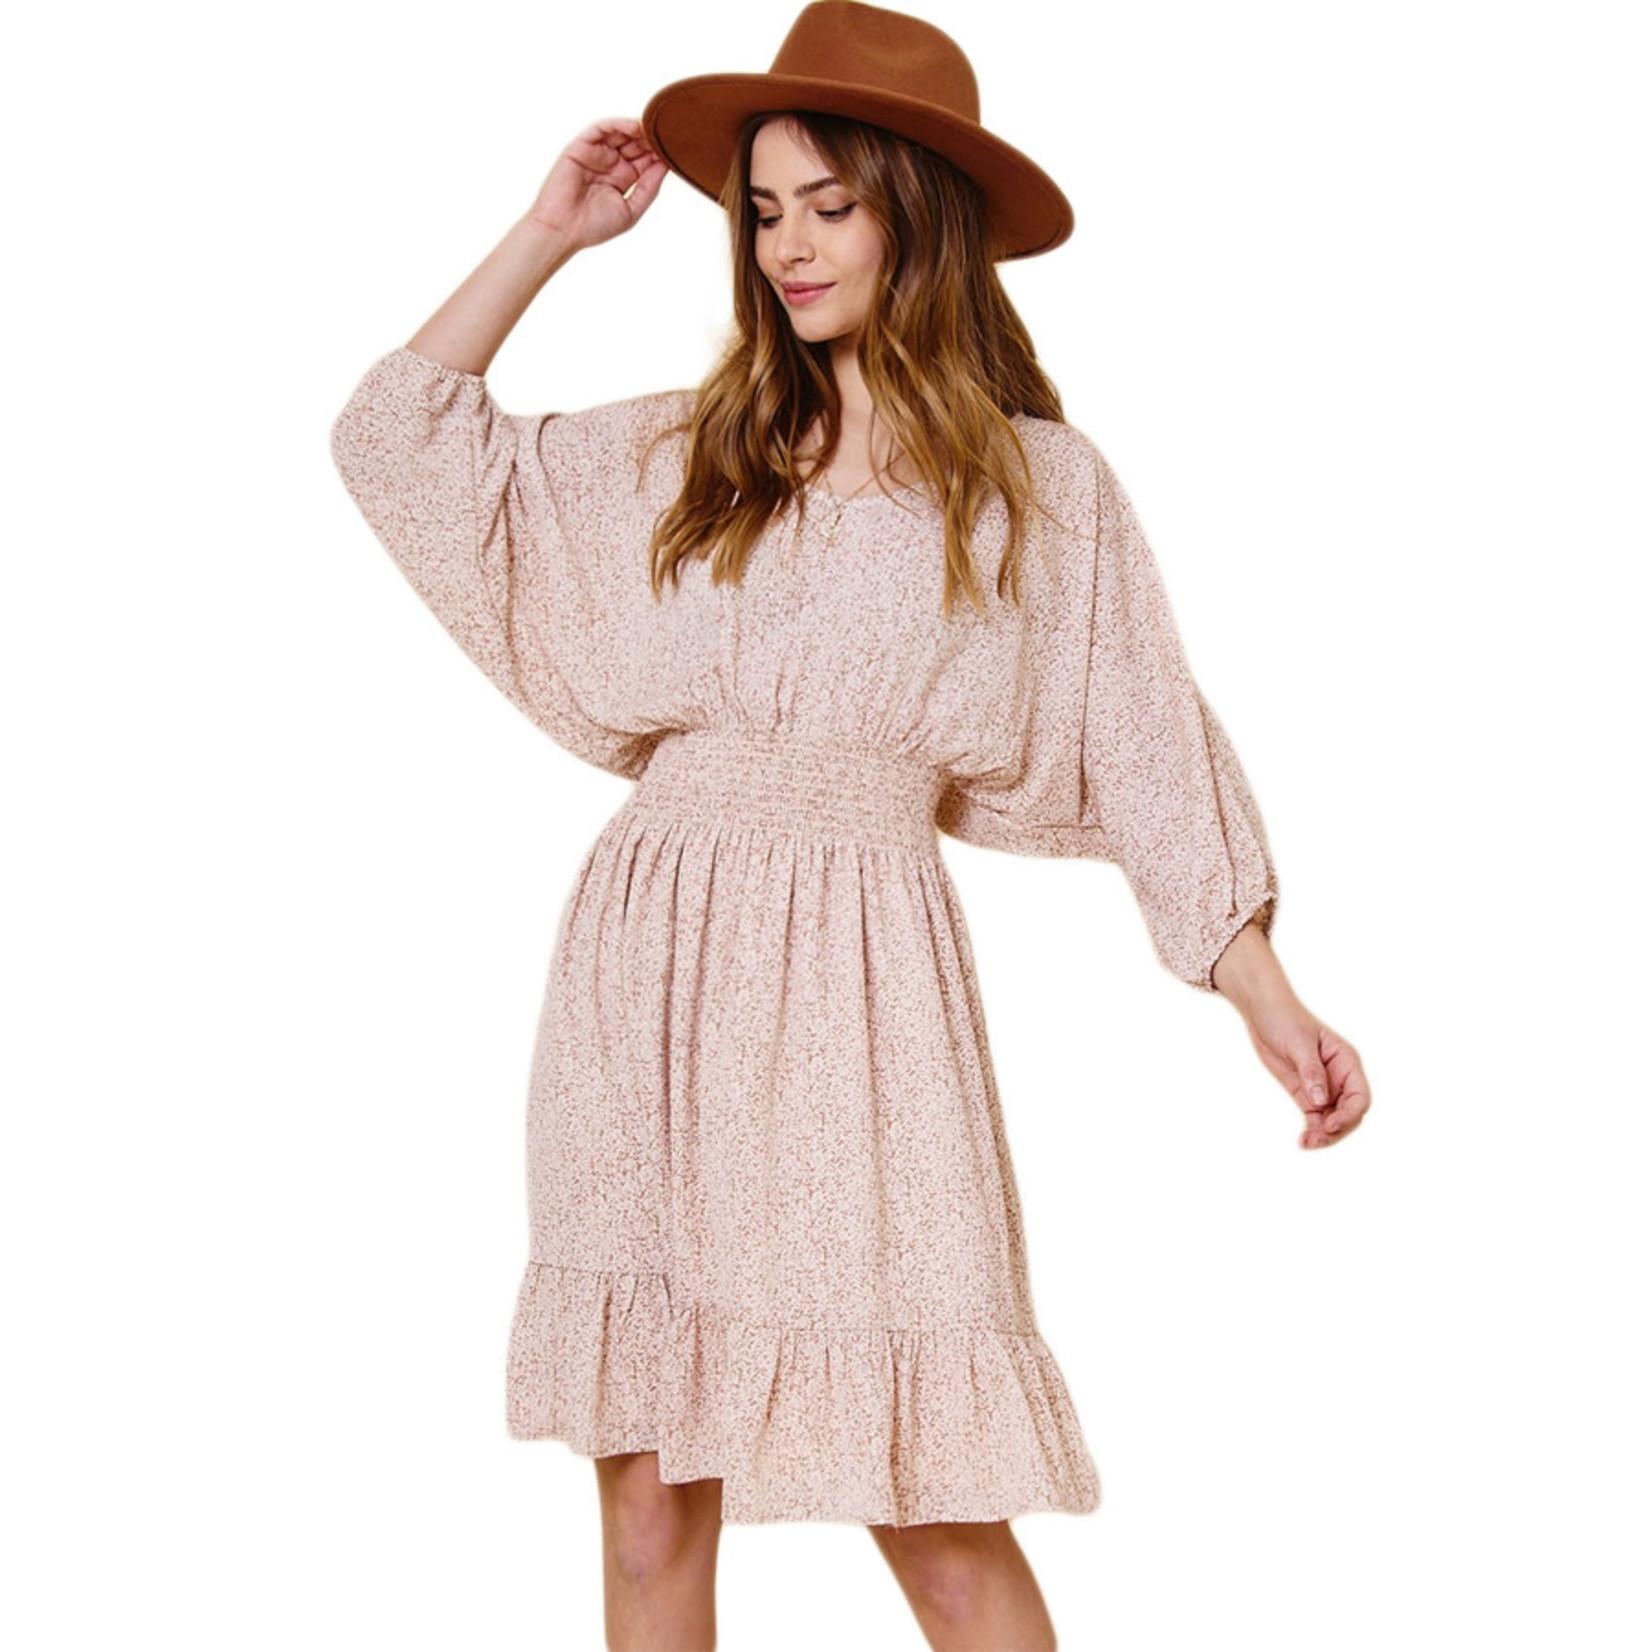 Ces Femme Taupe Cinche Waist Dress